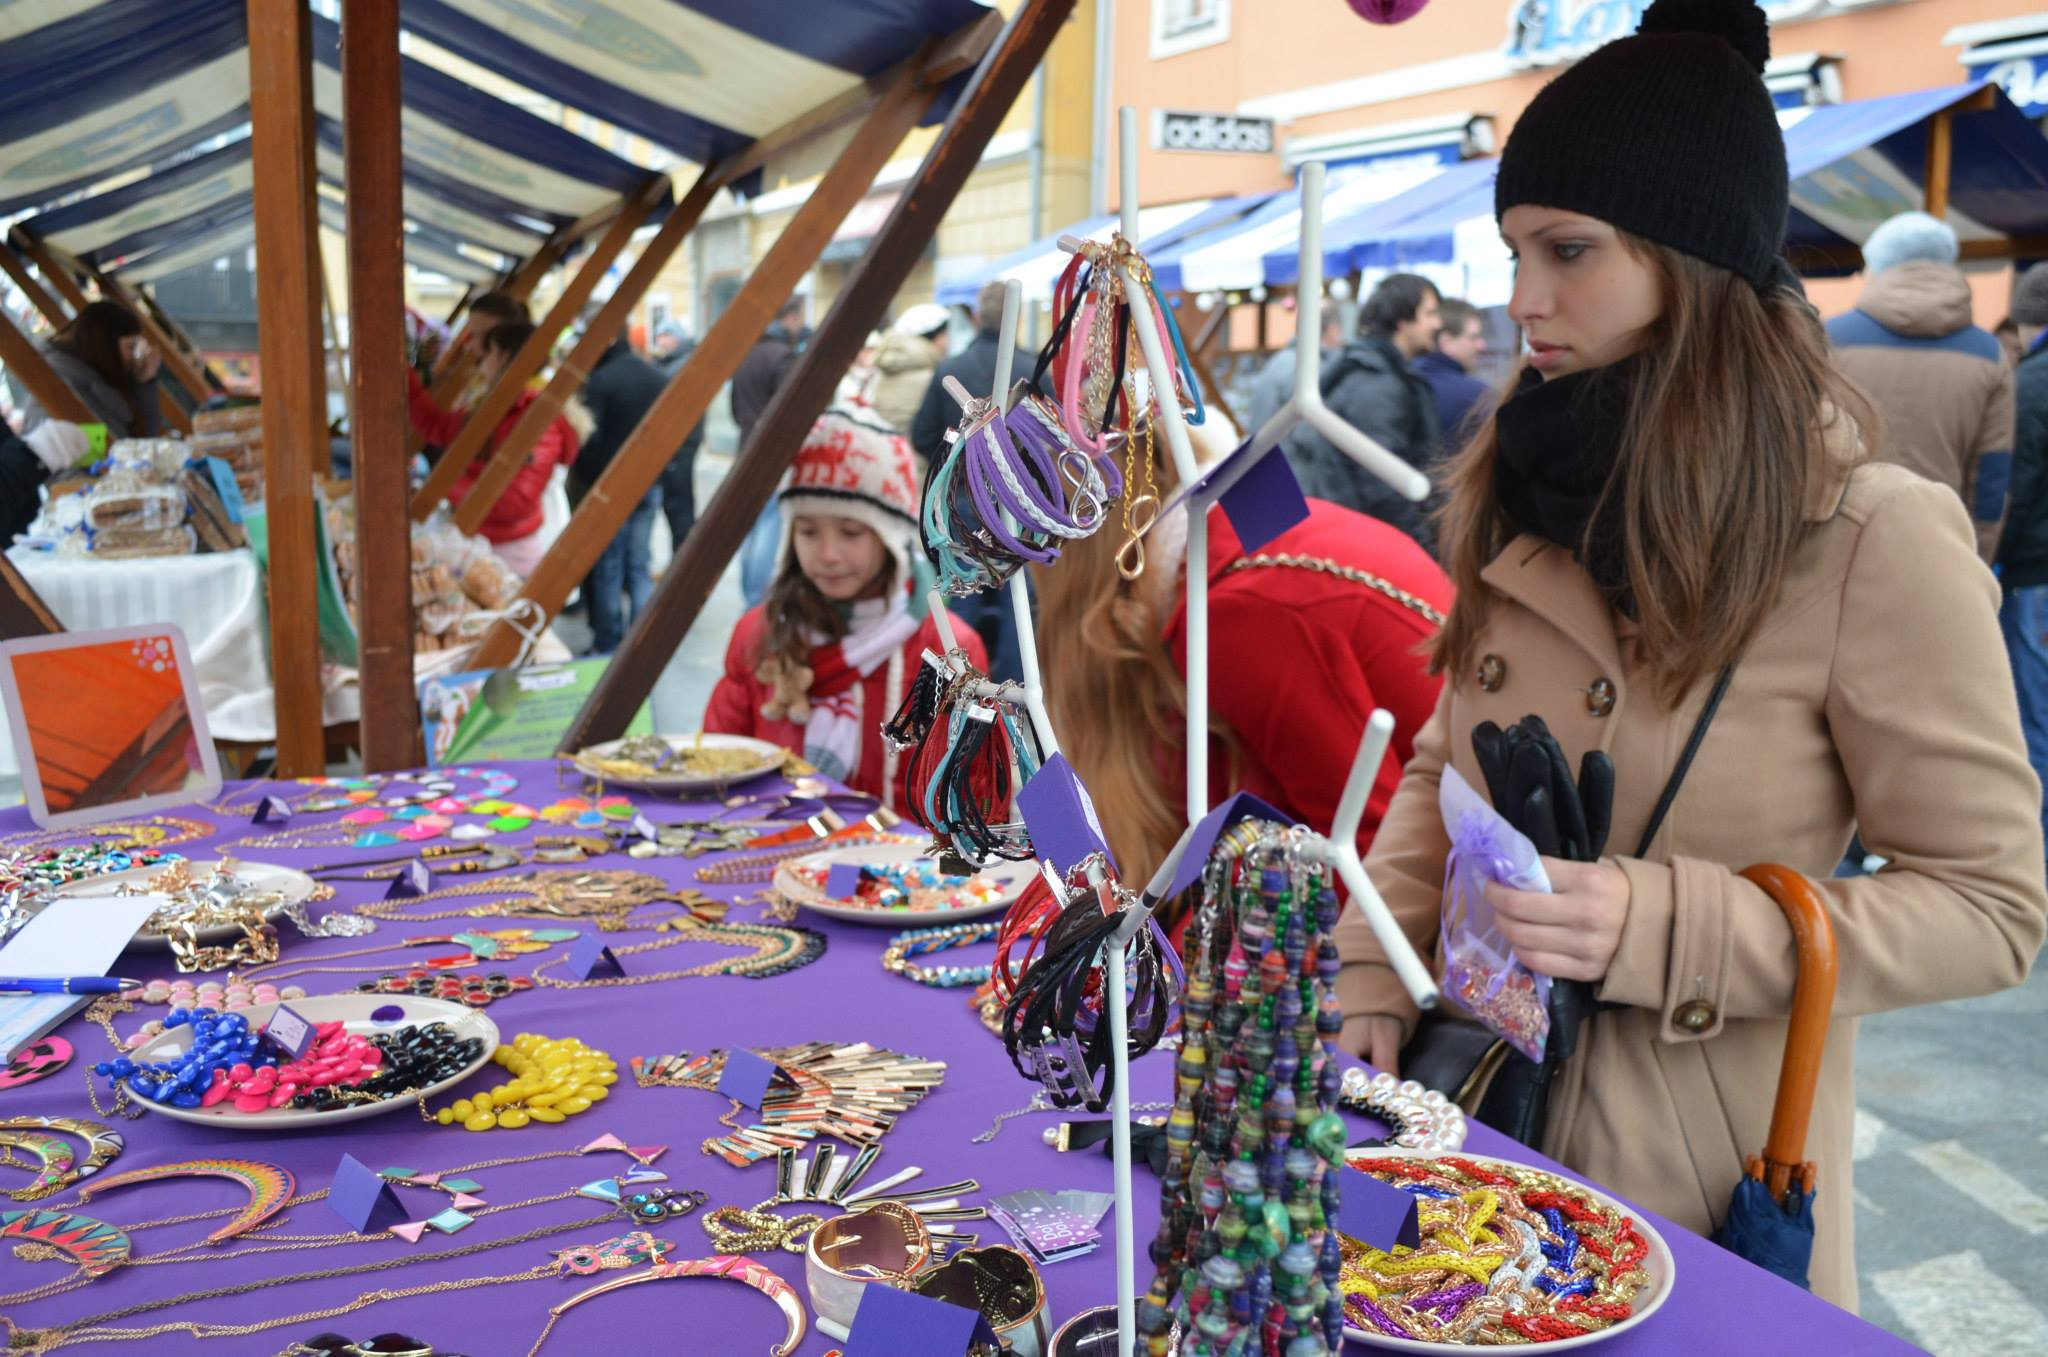 V soboto na Kerenčičevem trgu KOŠ-eva božična tržnica